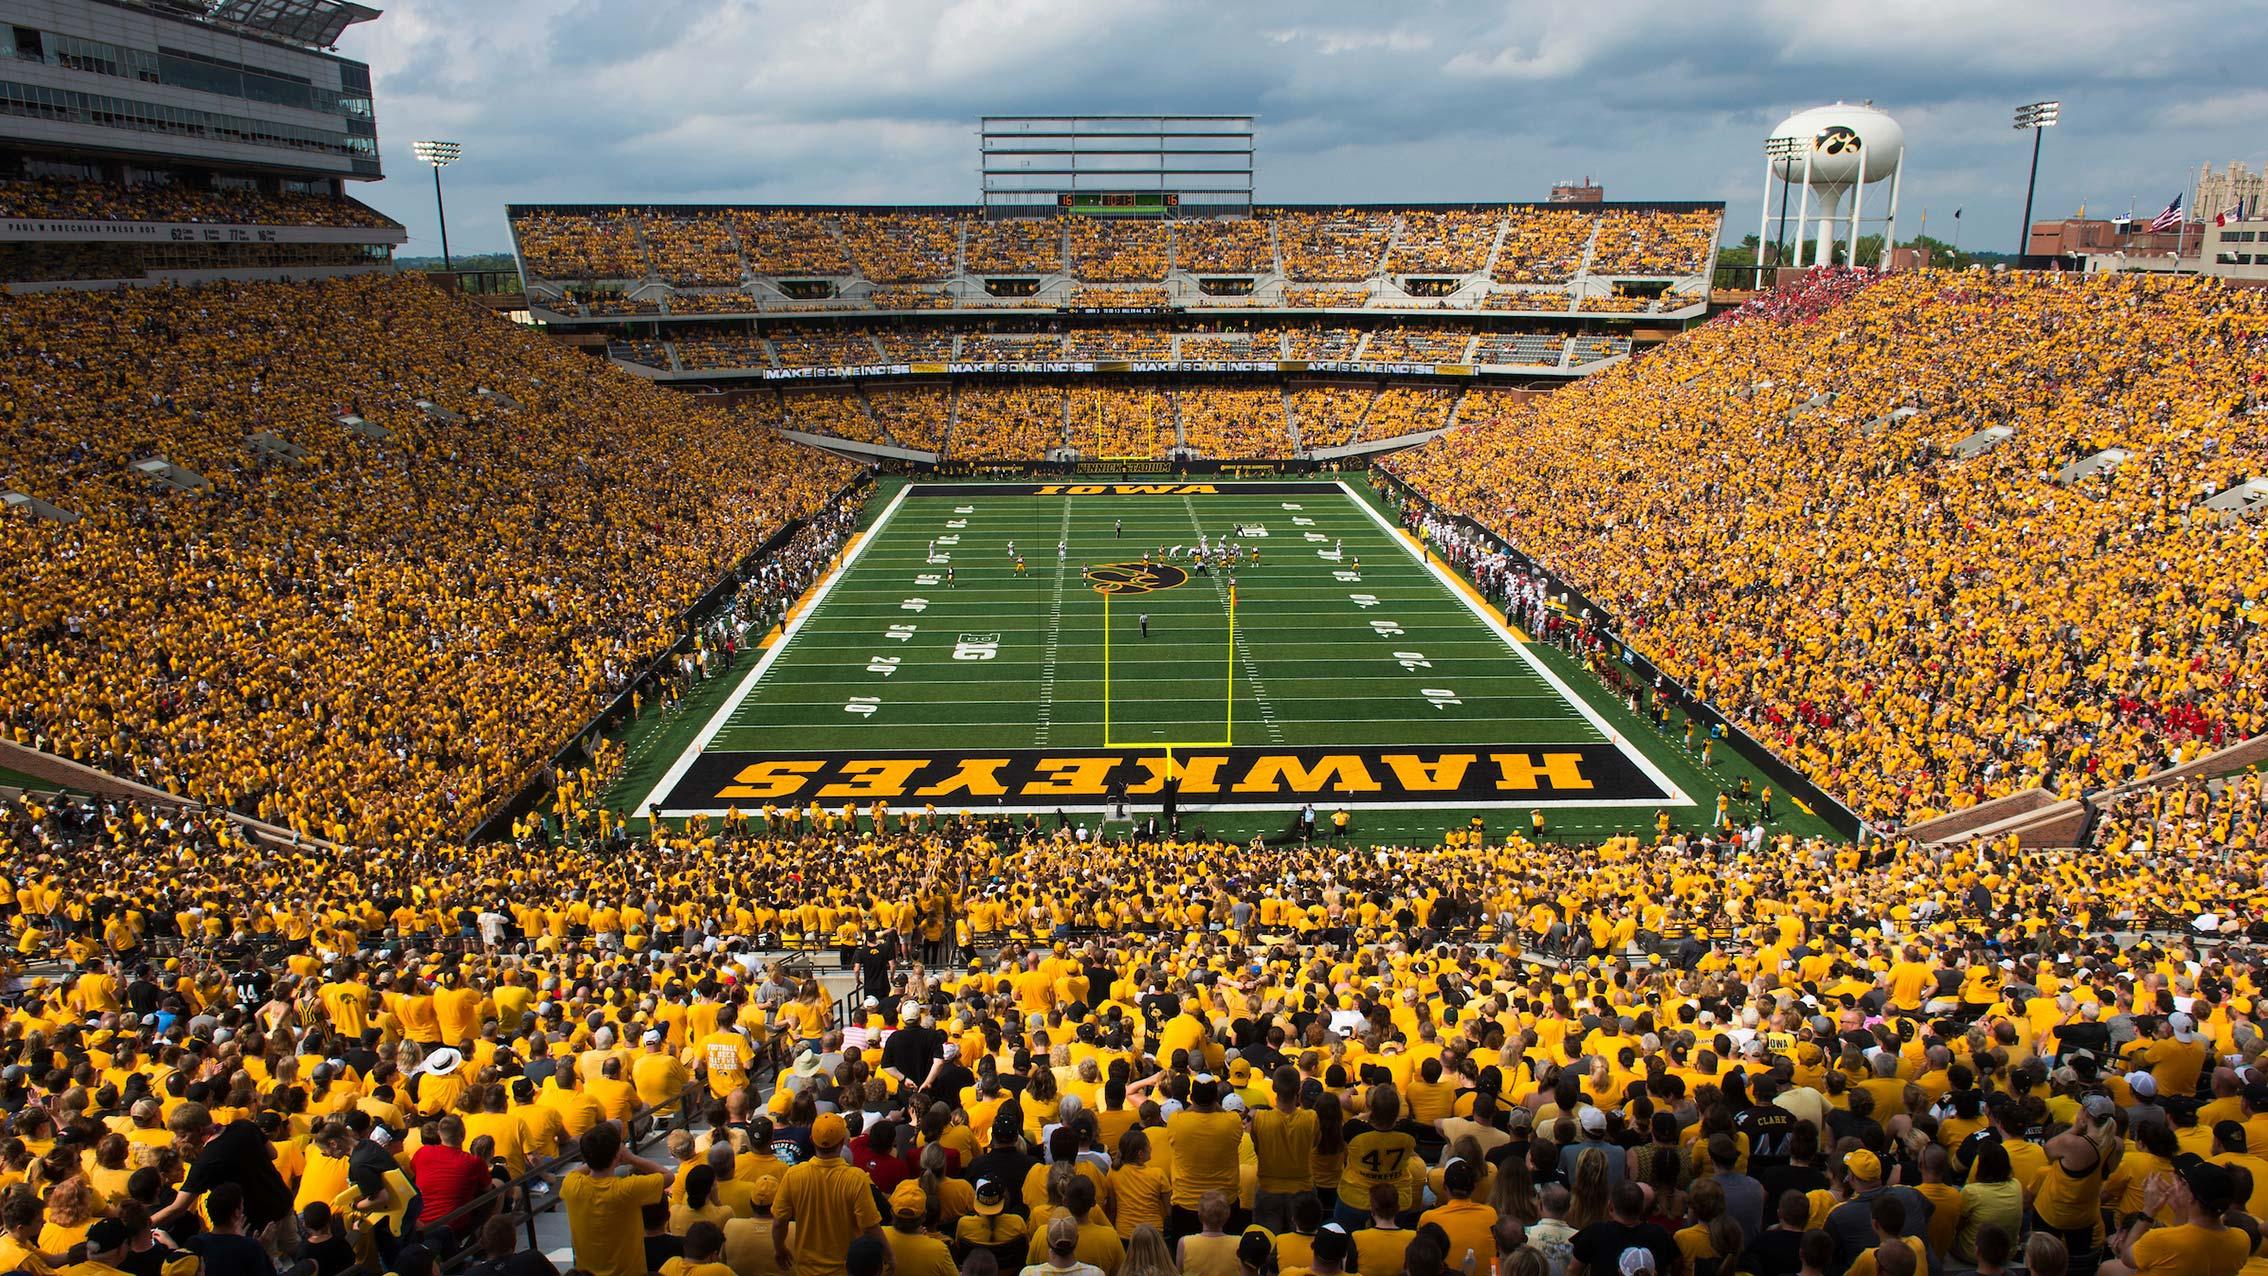 Iowa Kinnick Stadium Renovations American Football Field Diagram Previous Next